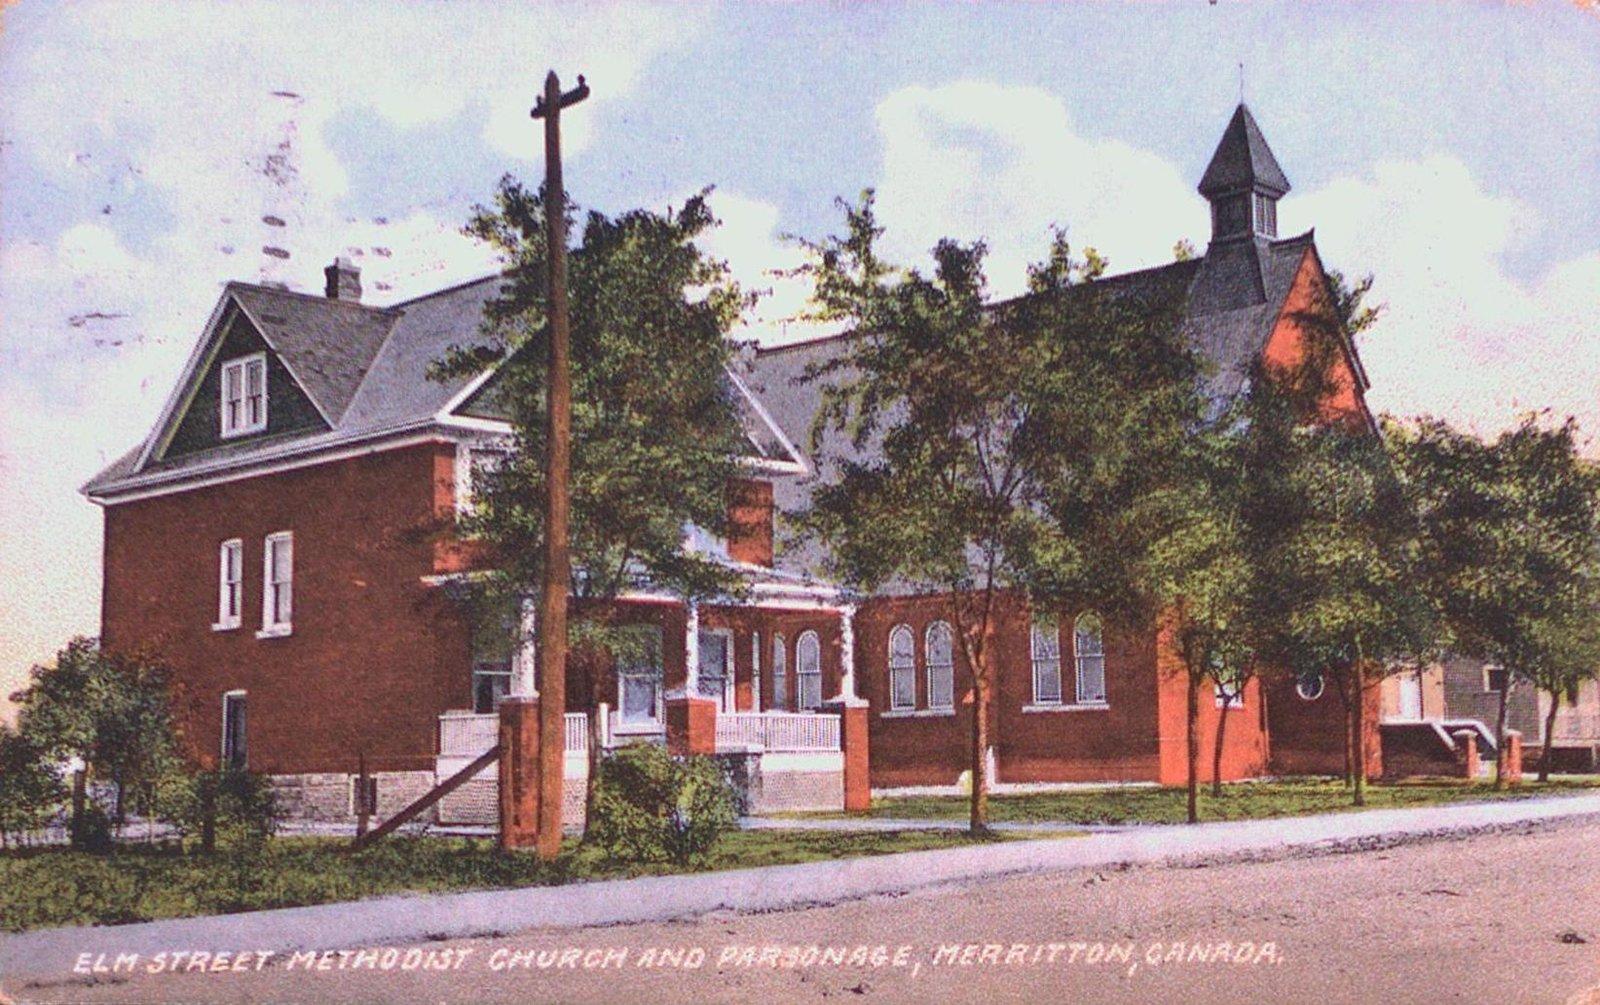 Elm Street Methodist Church and Parsonage